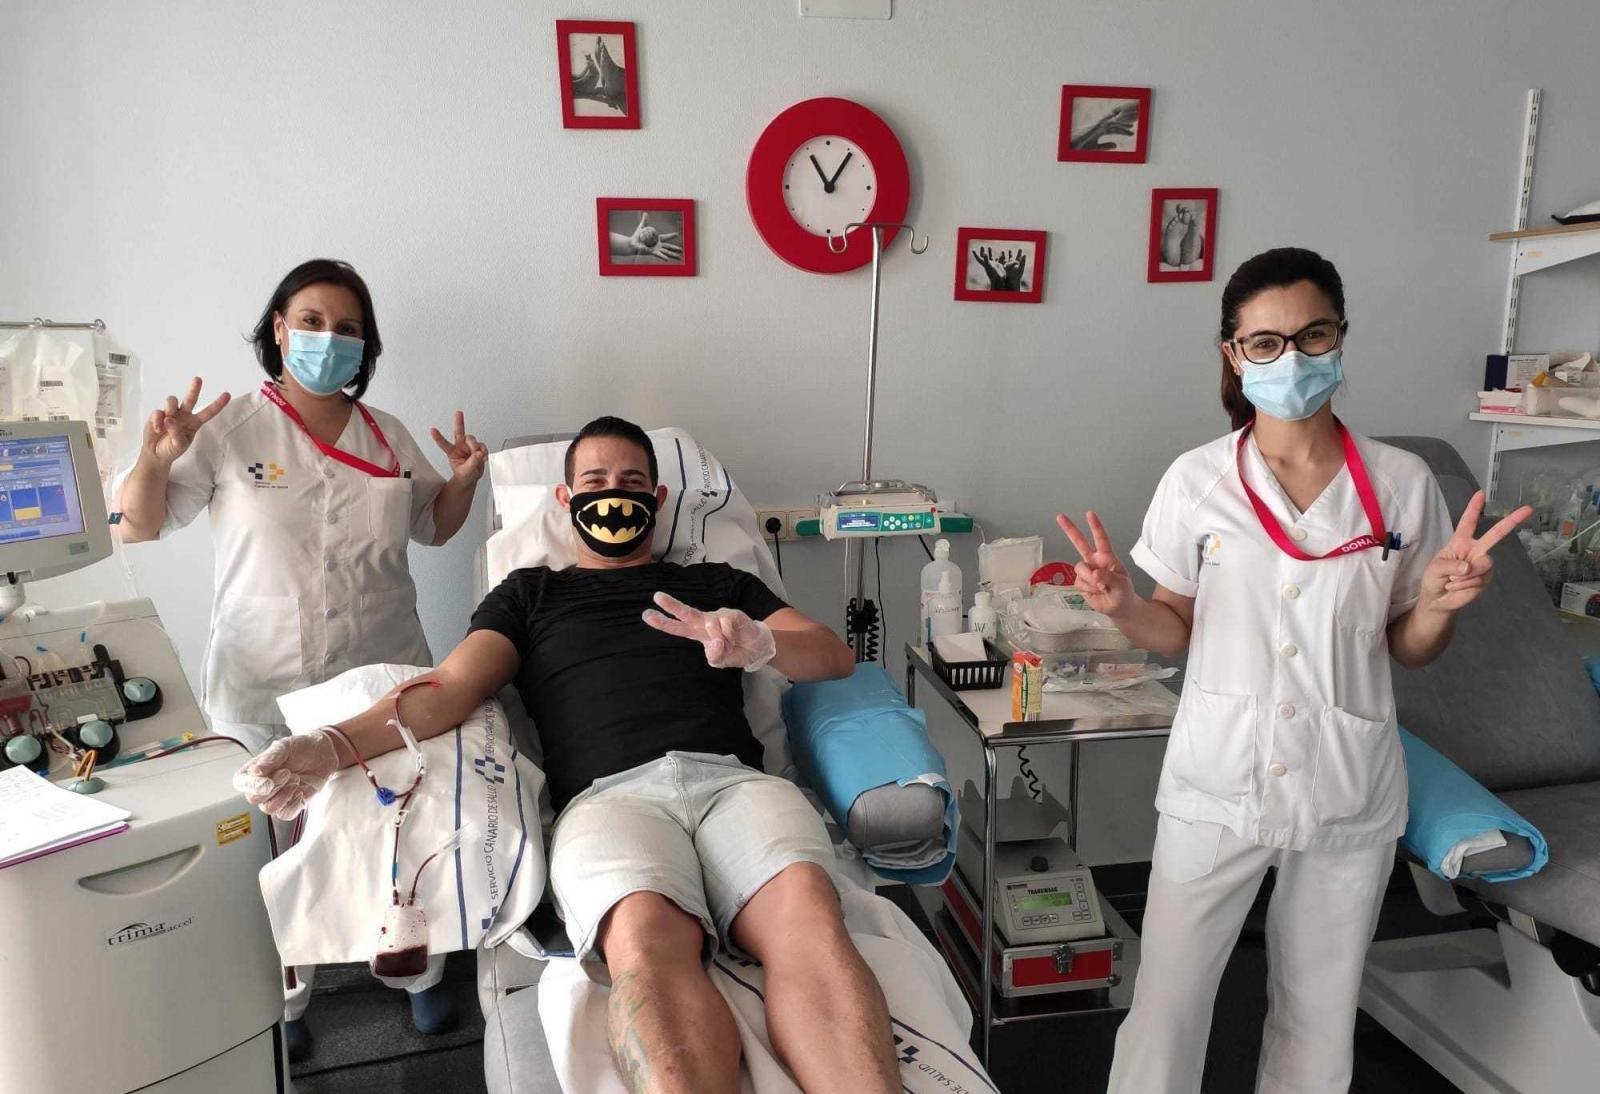 Punto de extracción de sangre